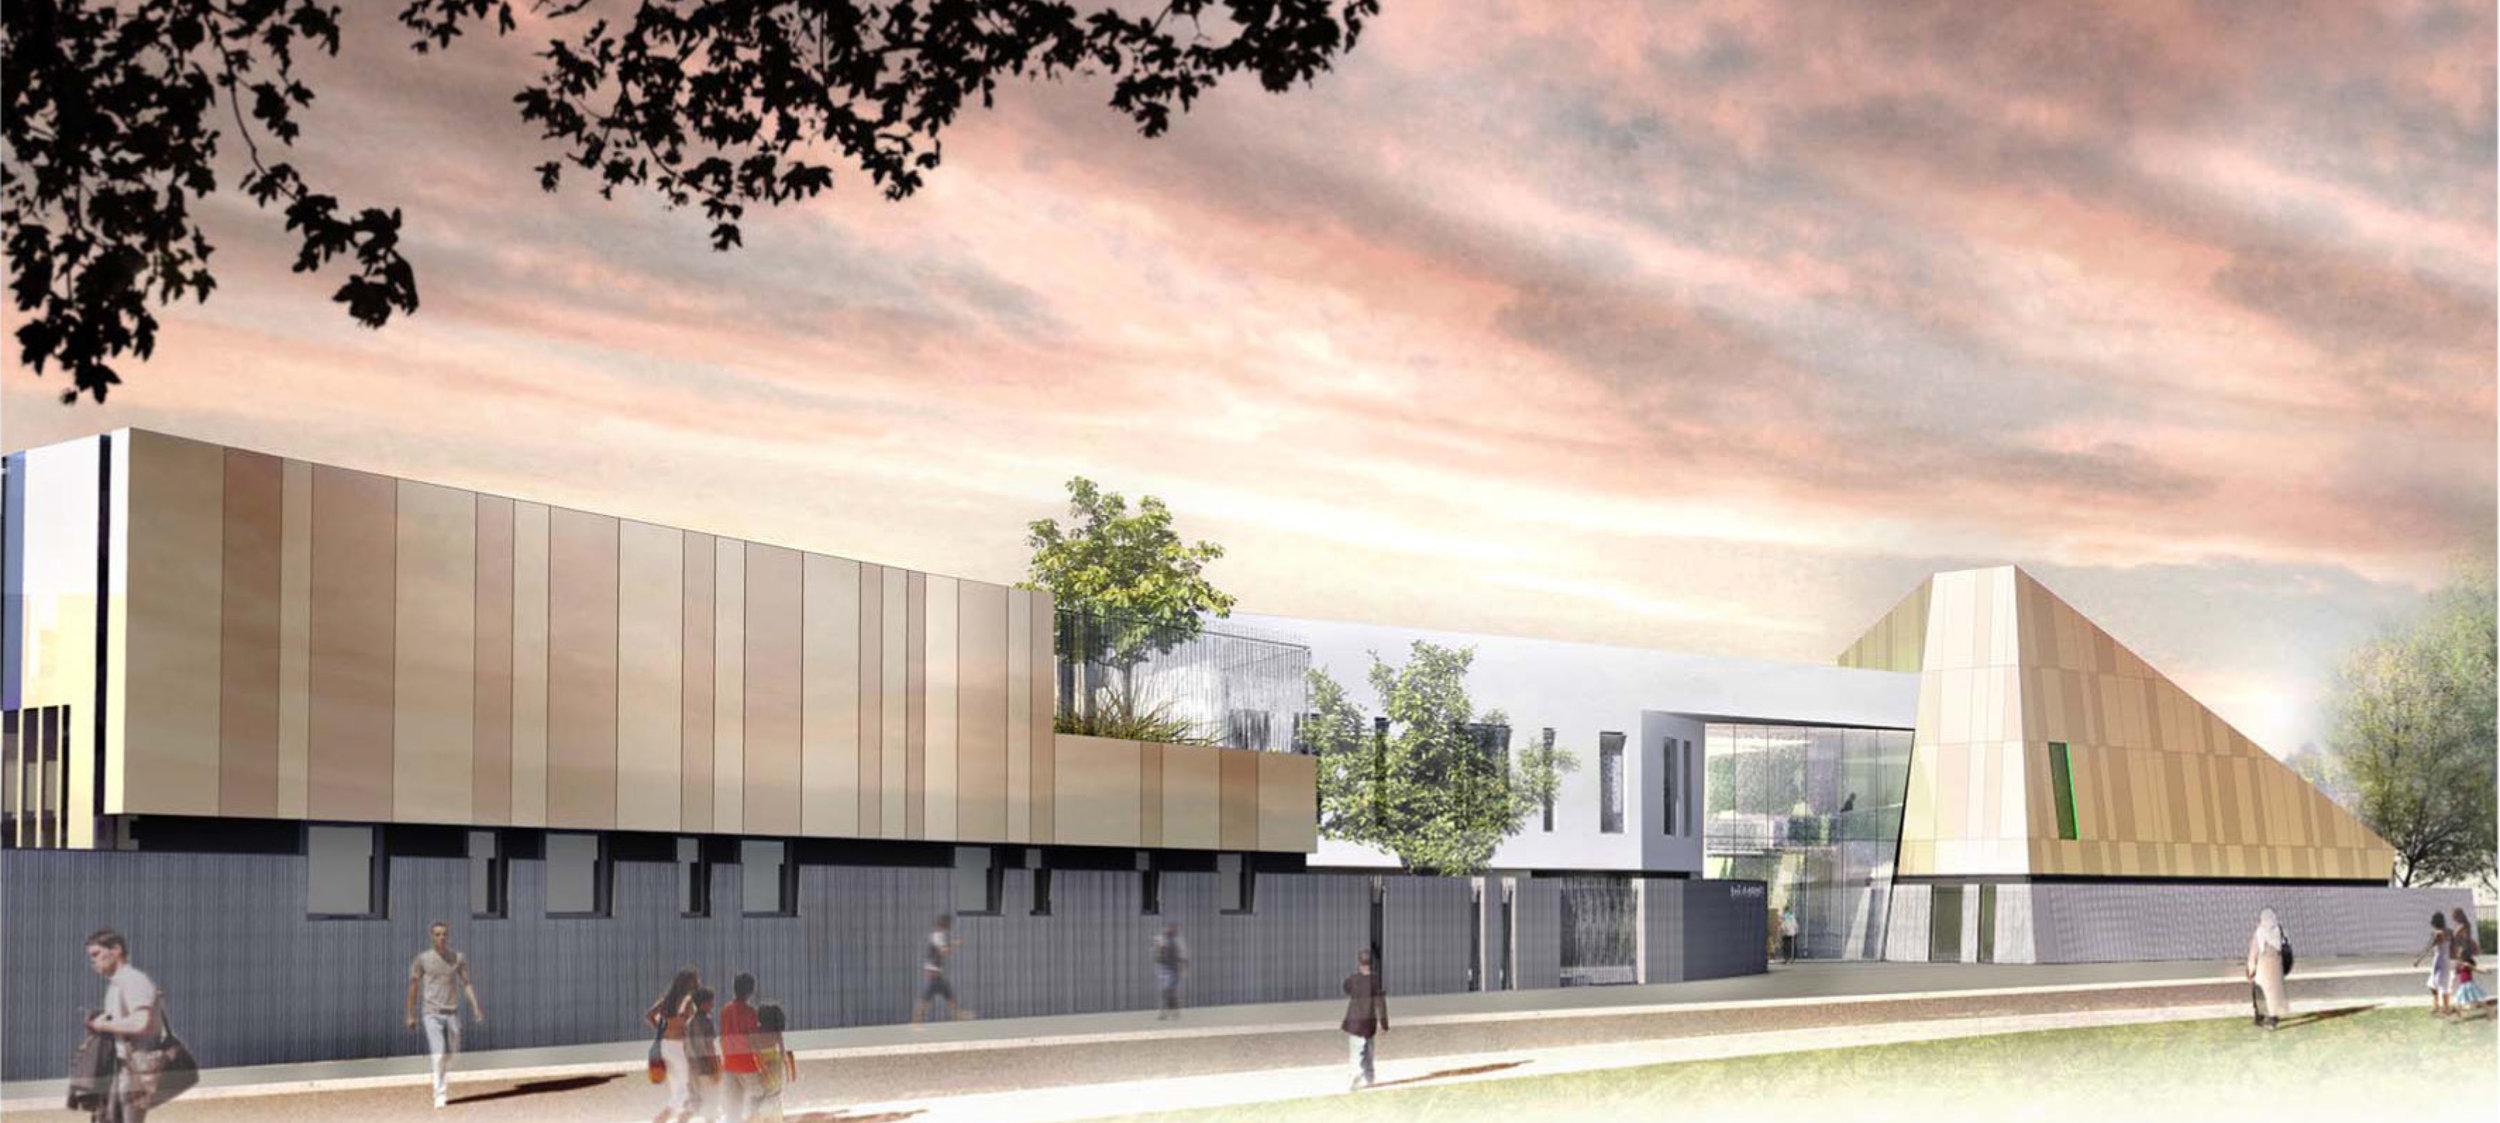 lycée_gabriel_péri_champigny_sur_marne_public_outdoor_design_christophe_gautrand_paysagiste_2.jpg